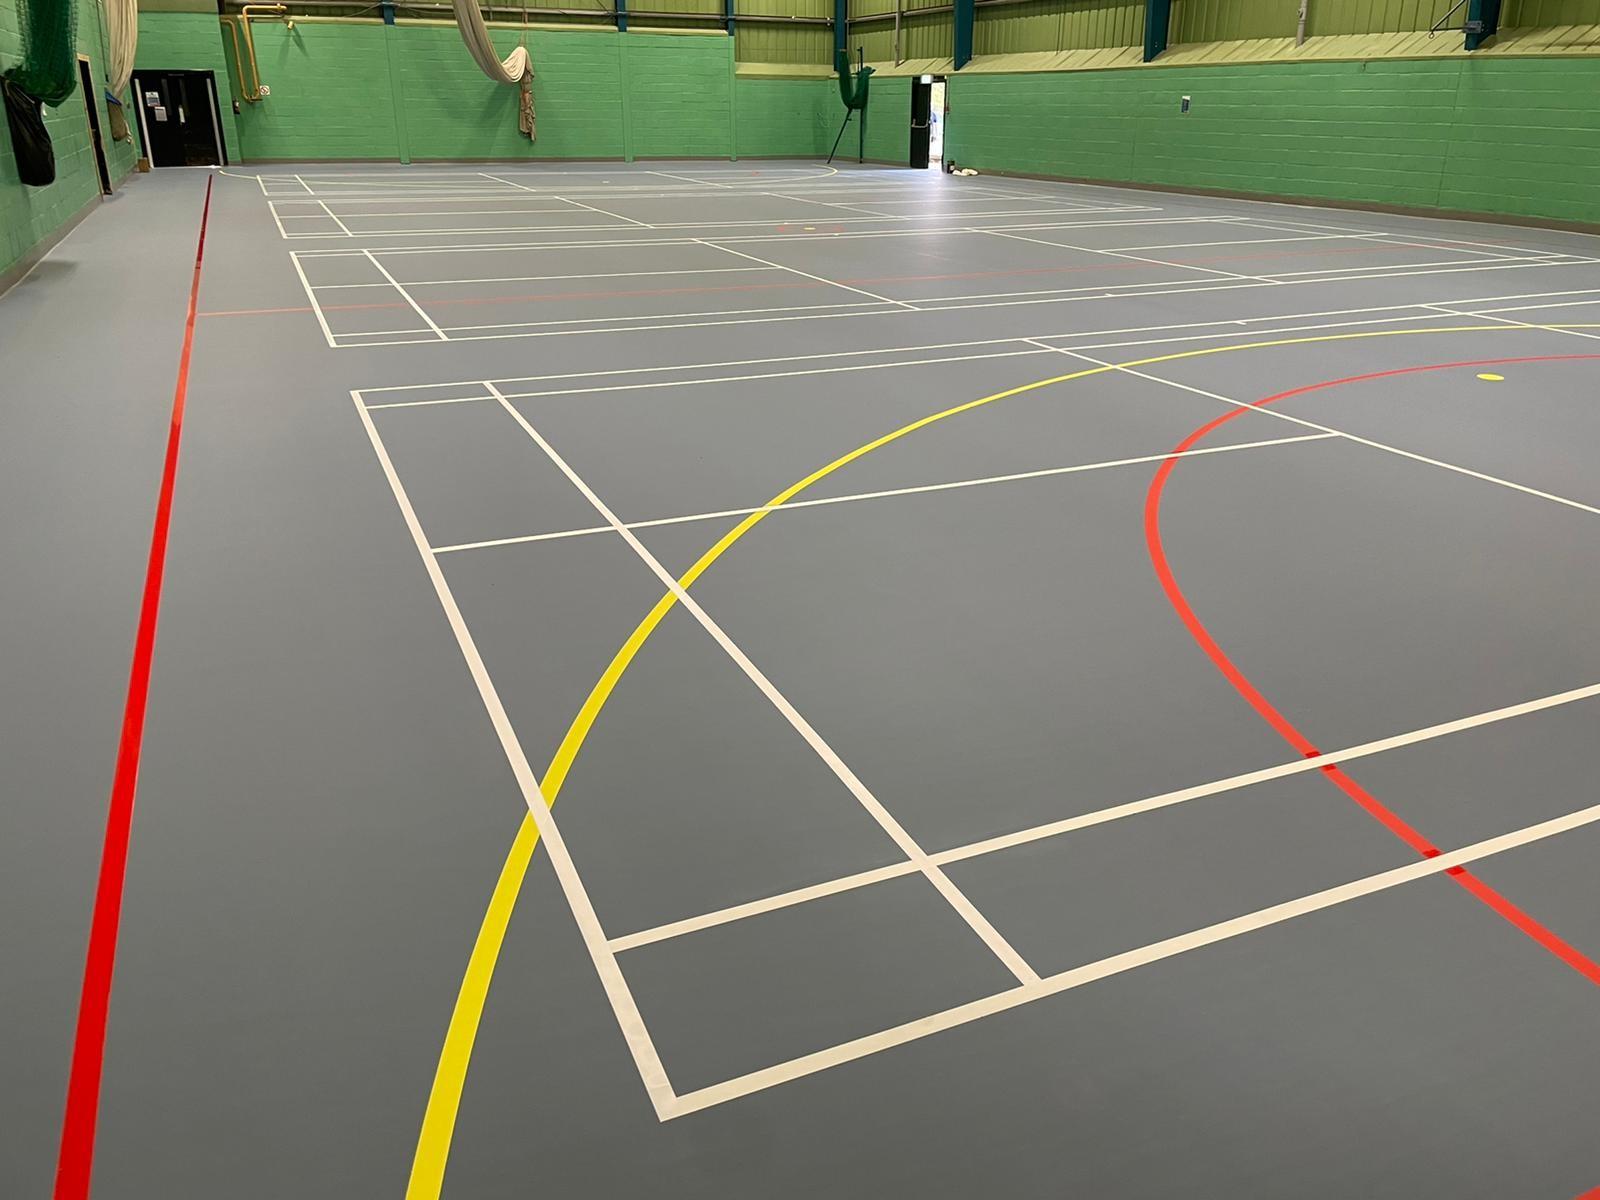 Our latest pigeon blue – Pulastic Classic 110 – multiuse indoor sports floor